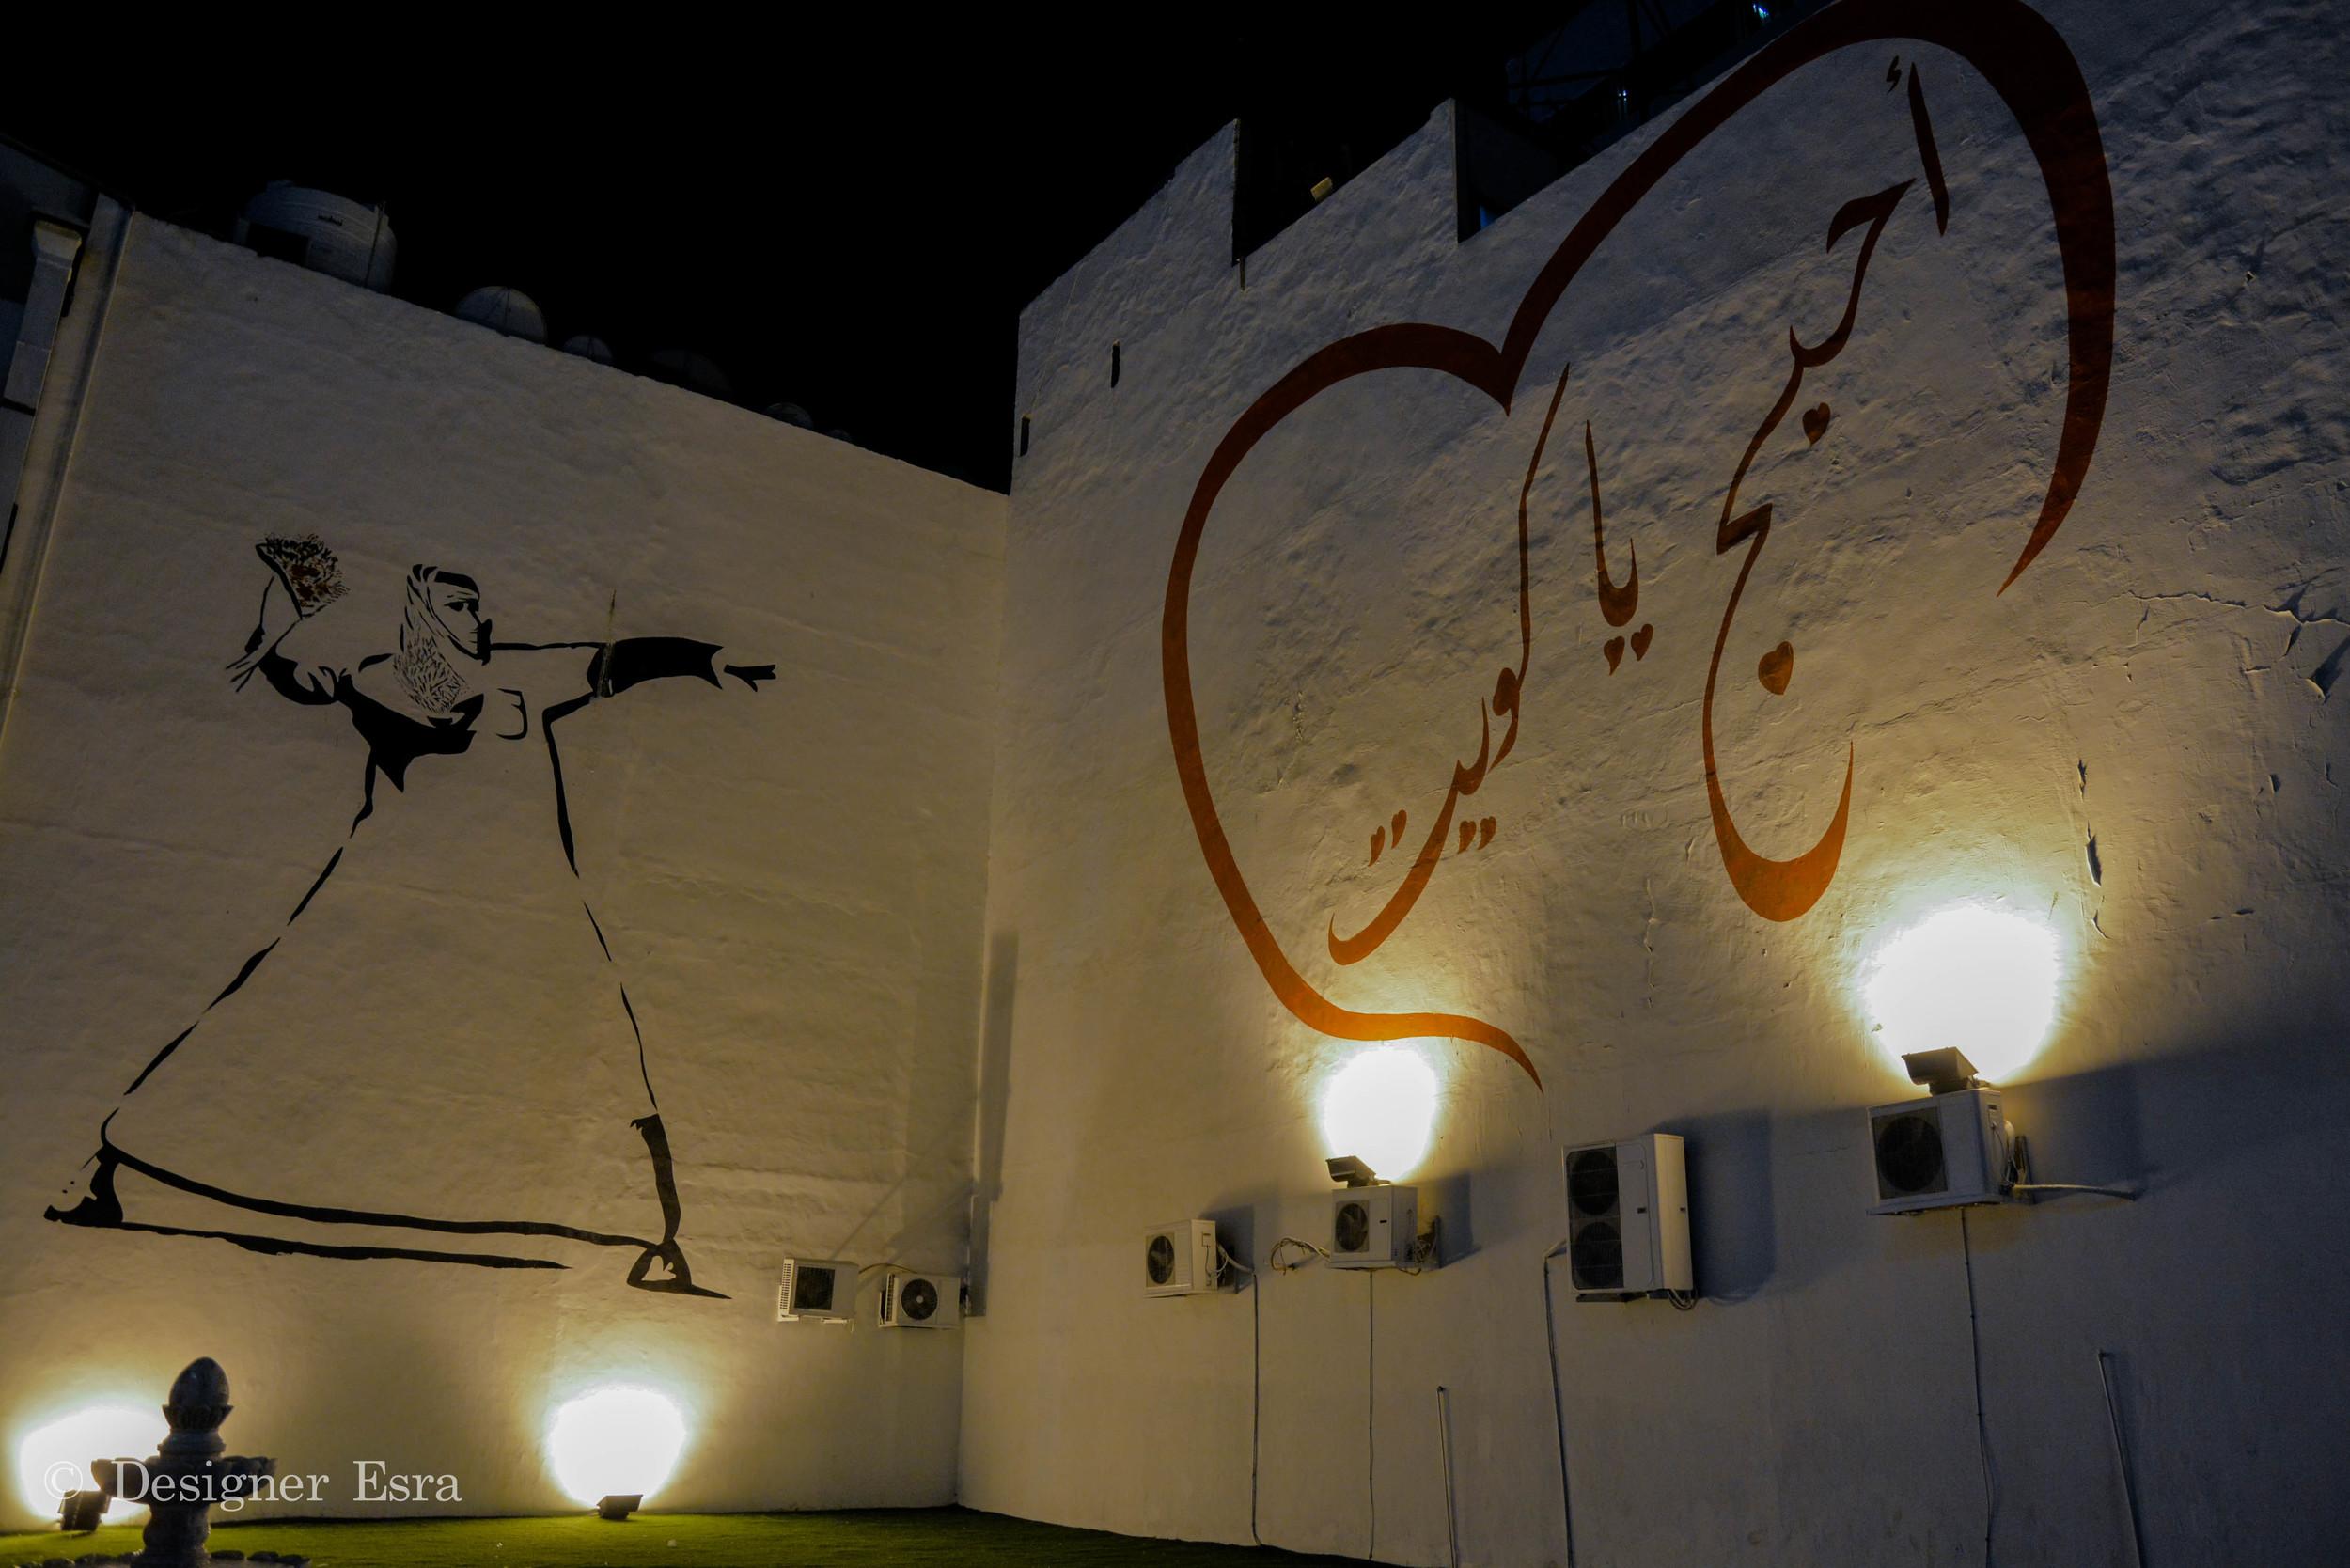 Arabic graffiti Typography